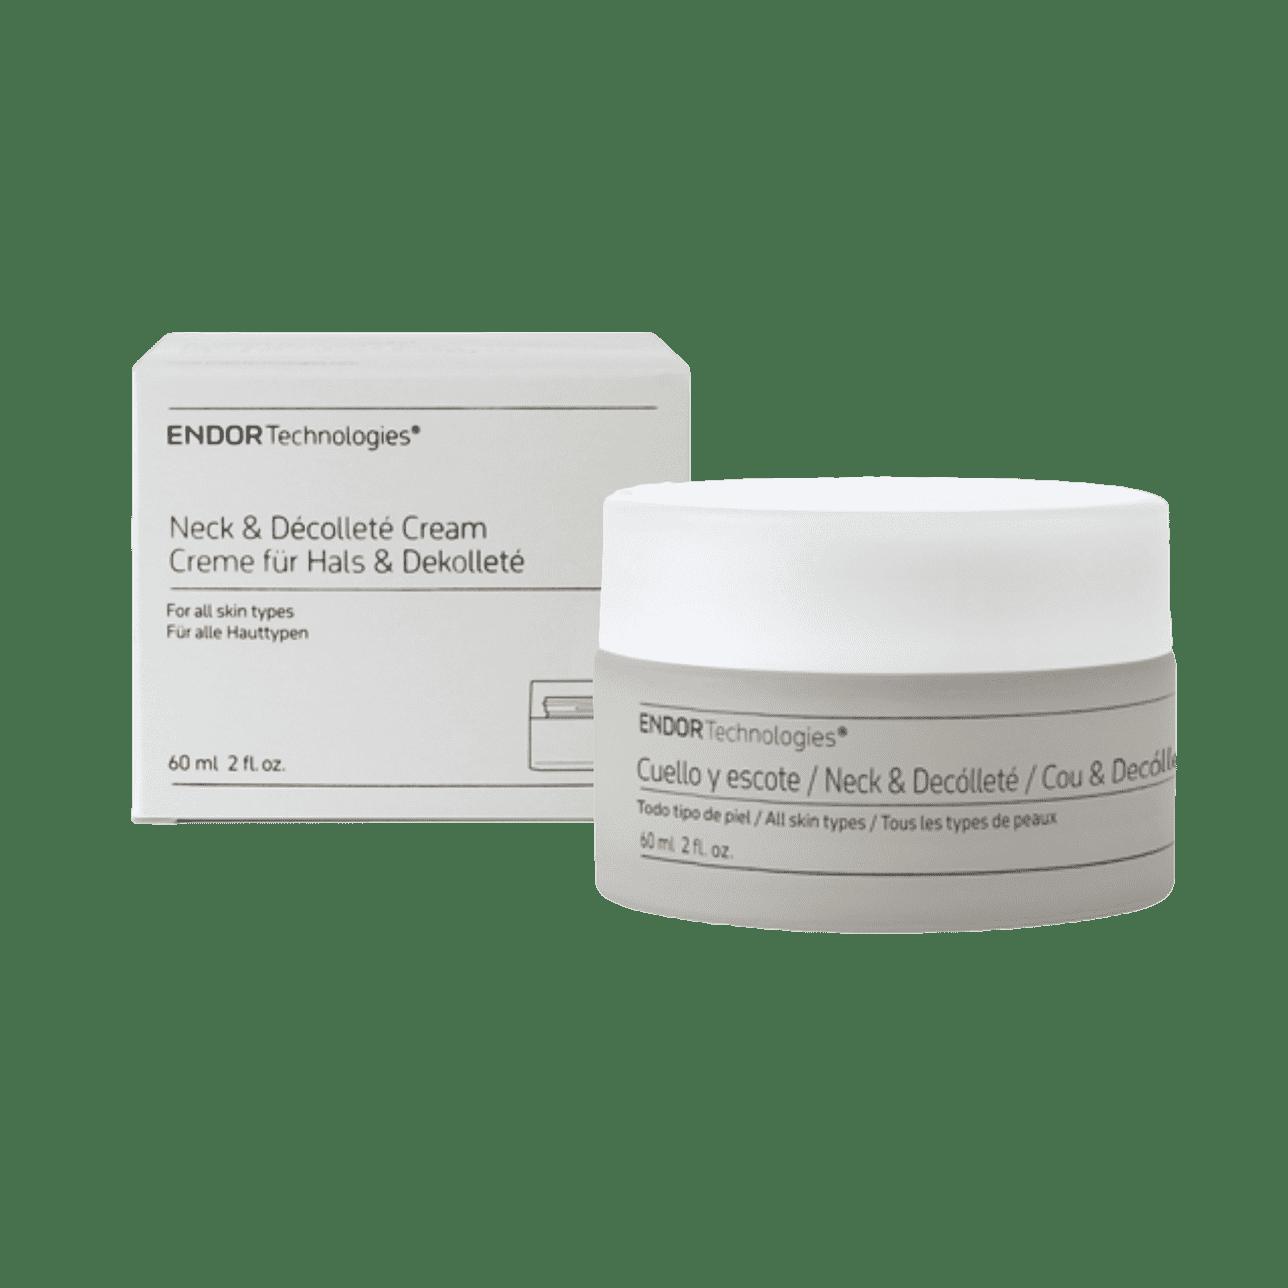 Endor Technologies Neck & Decollete Cream